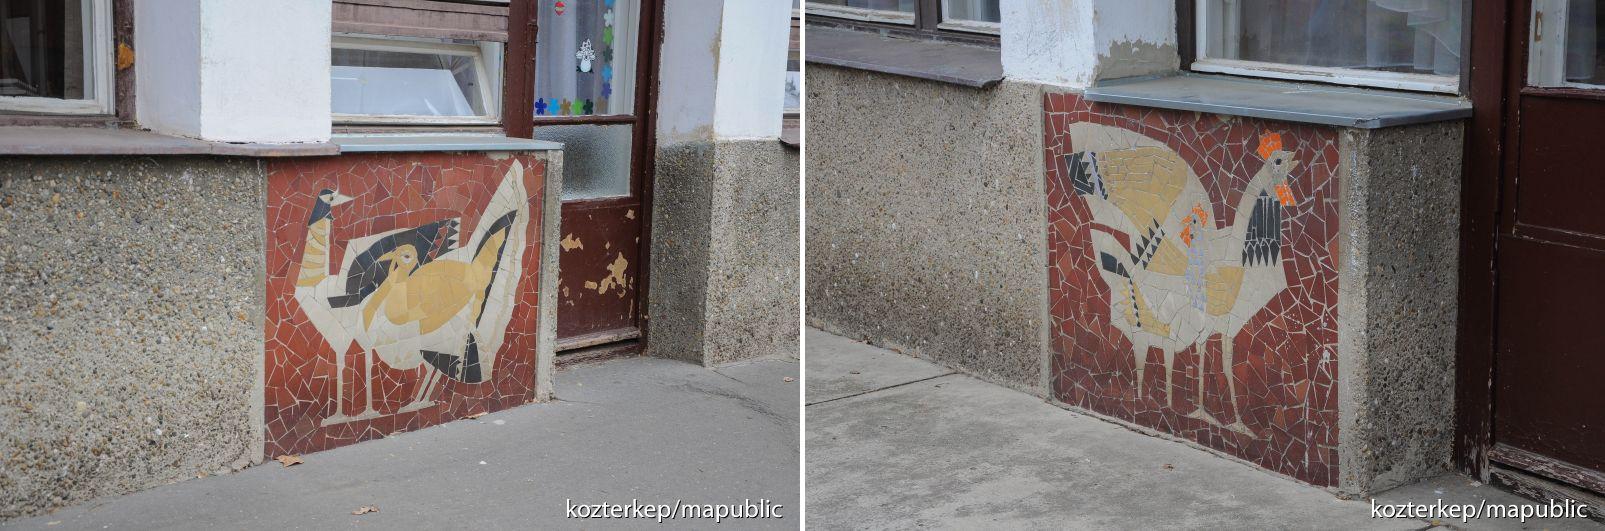 koztarsasag_teri_bolcsode_mozaik_allatfigurak_3-4.jpg